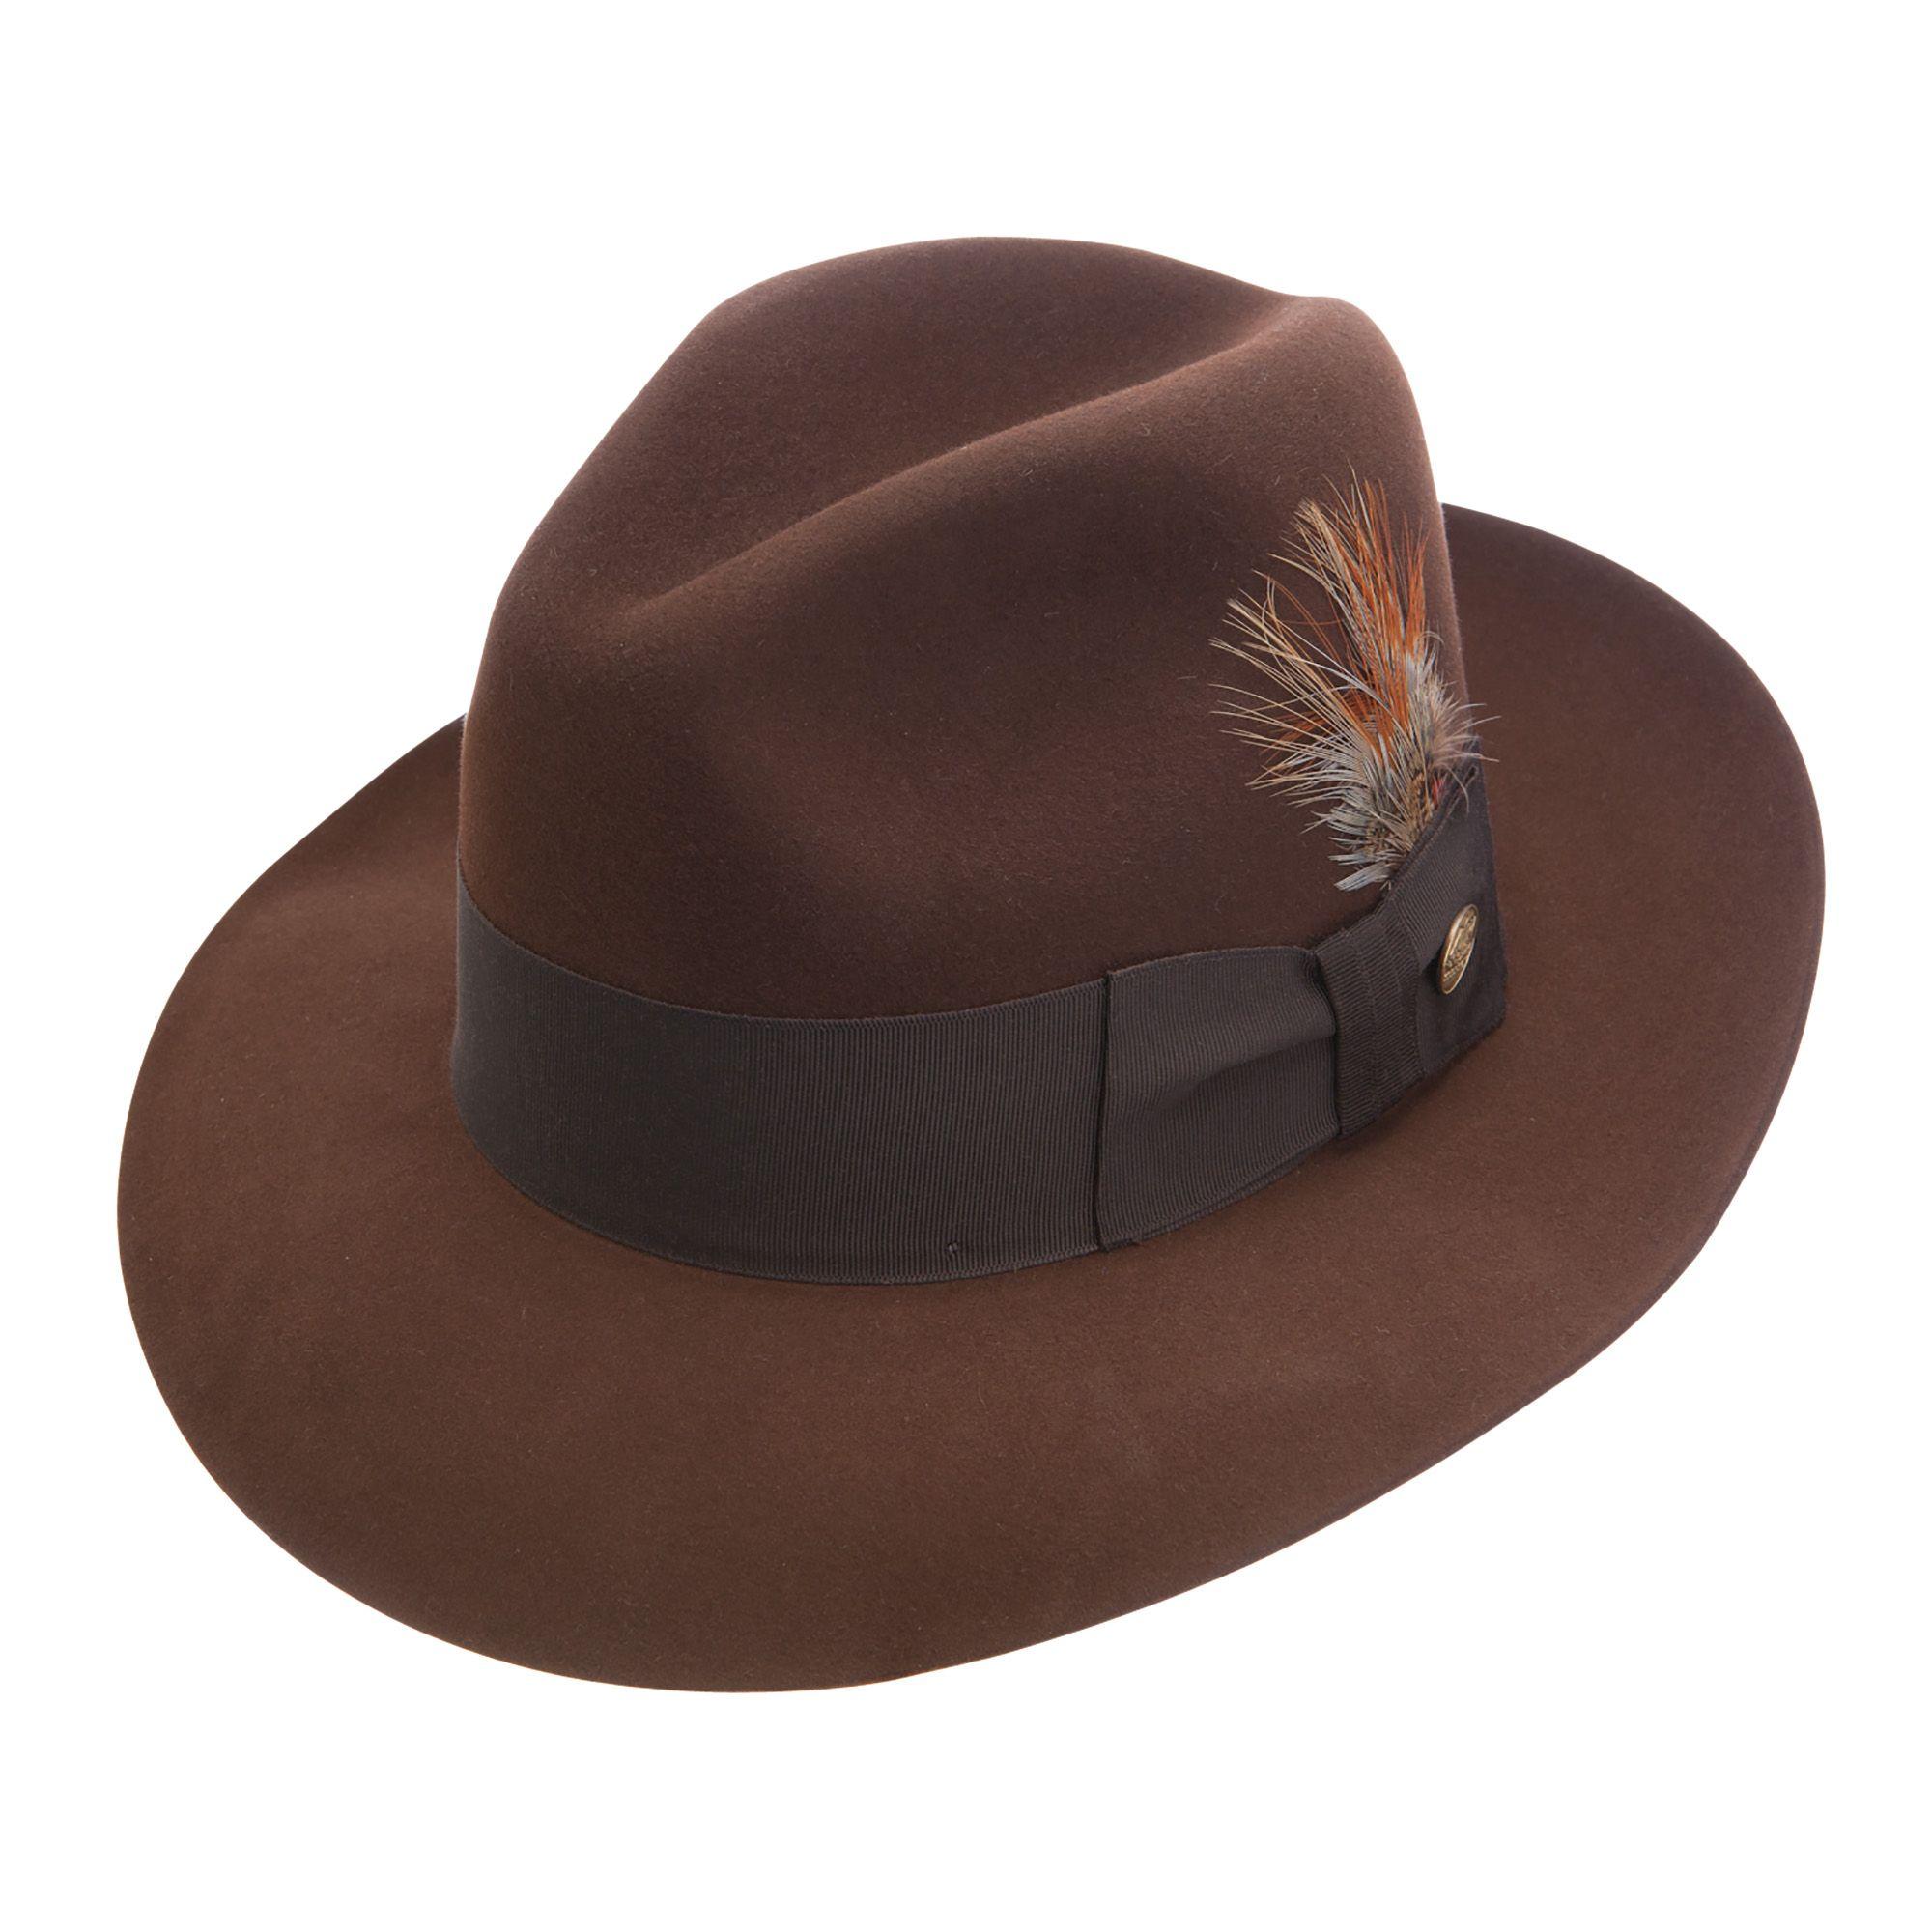 e3820b14498b5f Pinnacle Detective Outfit, Dress Hats, Hat Making, Fedora Hats, Hats For Men